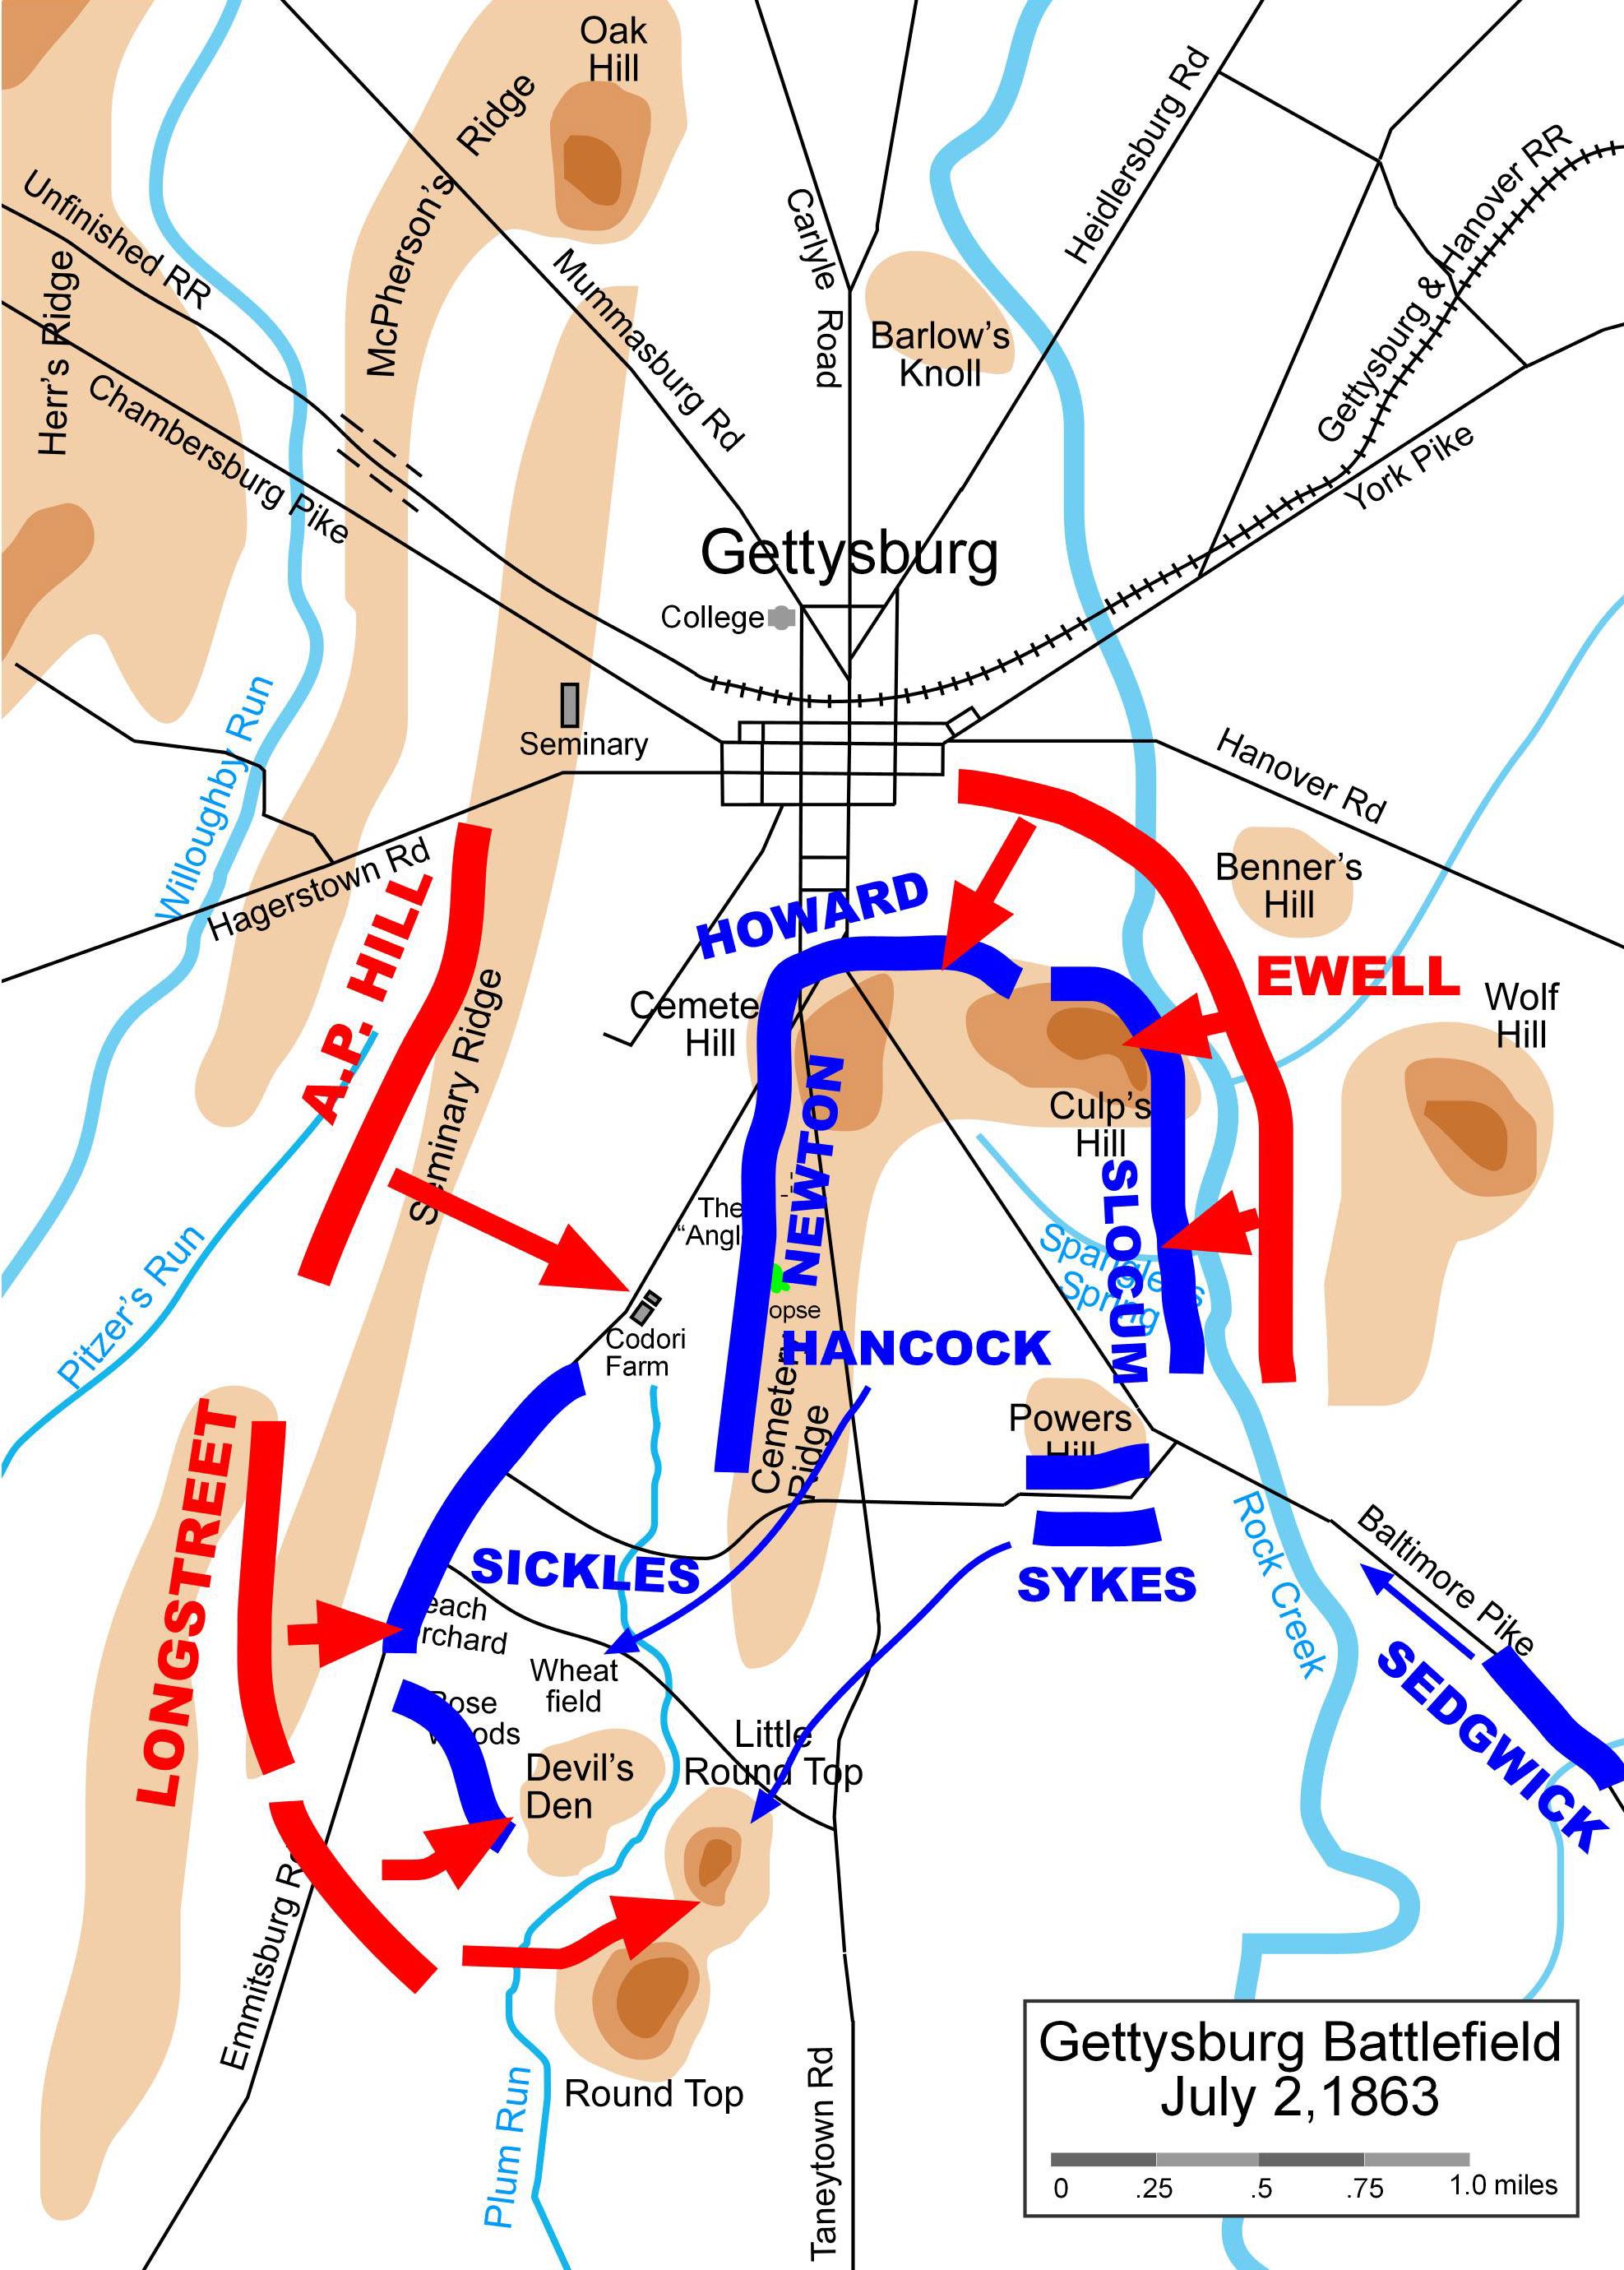 Battle of gettysburg date in Brisbane